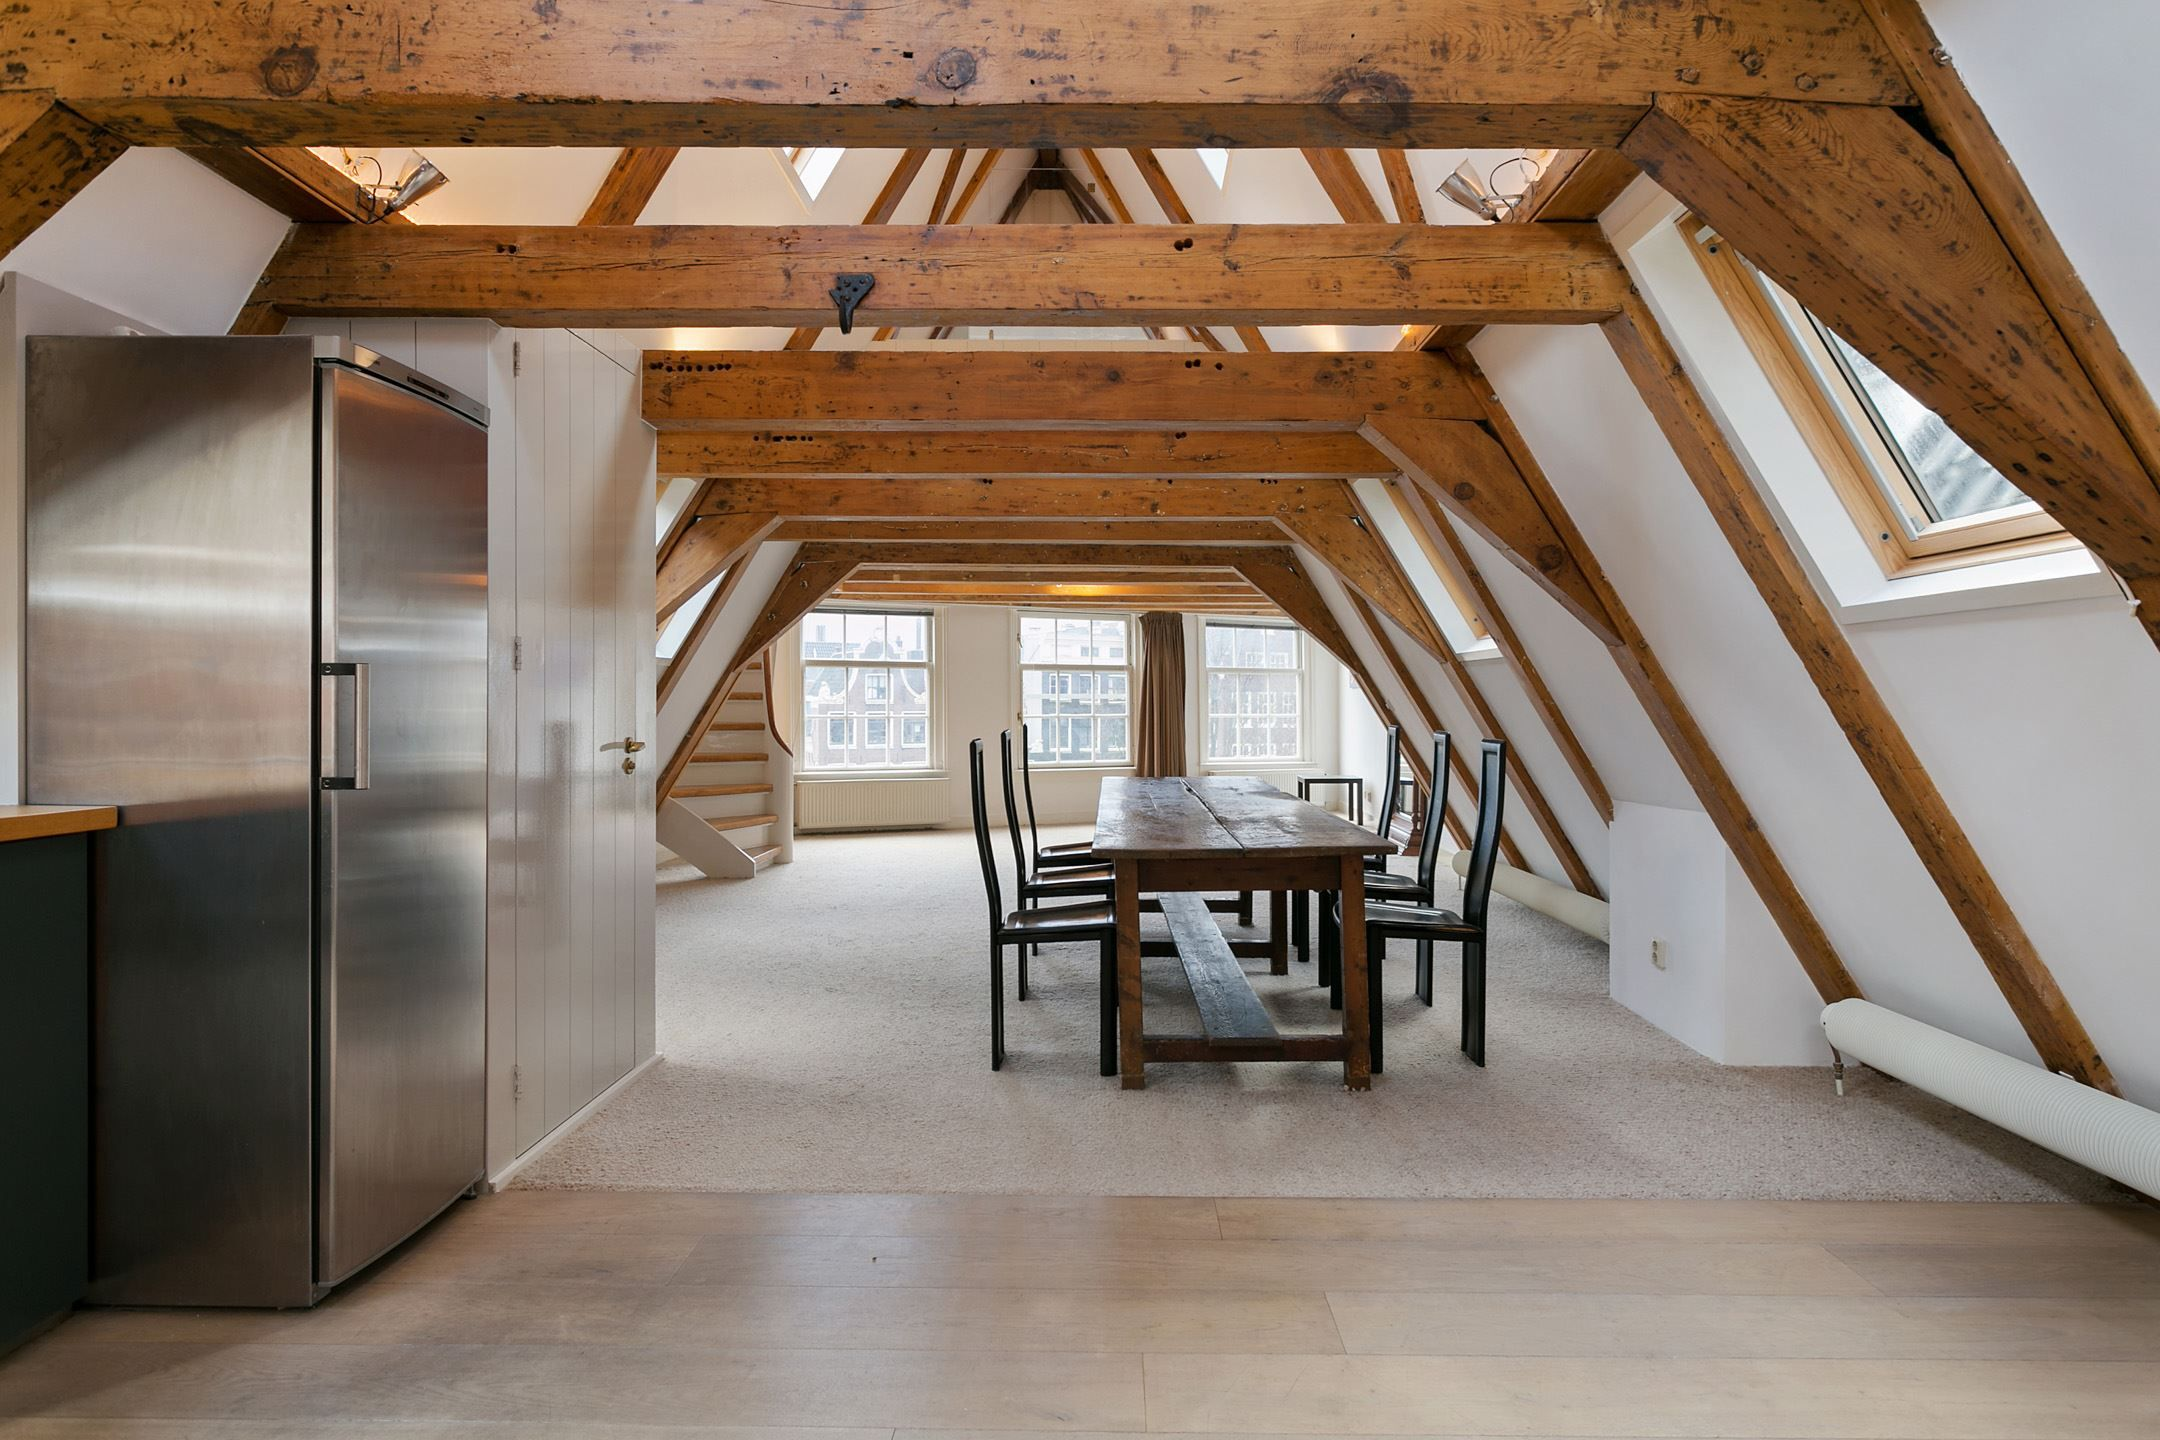 Apartment for rent: Geldersekade 6 E 1012 BH Amsterdam